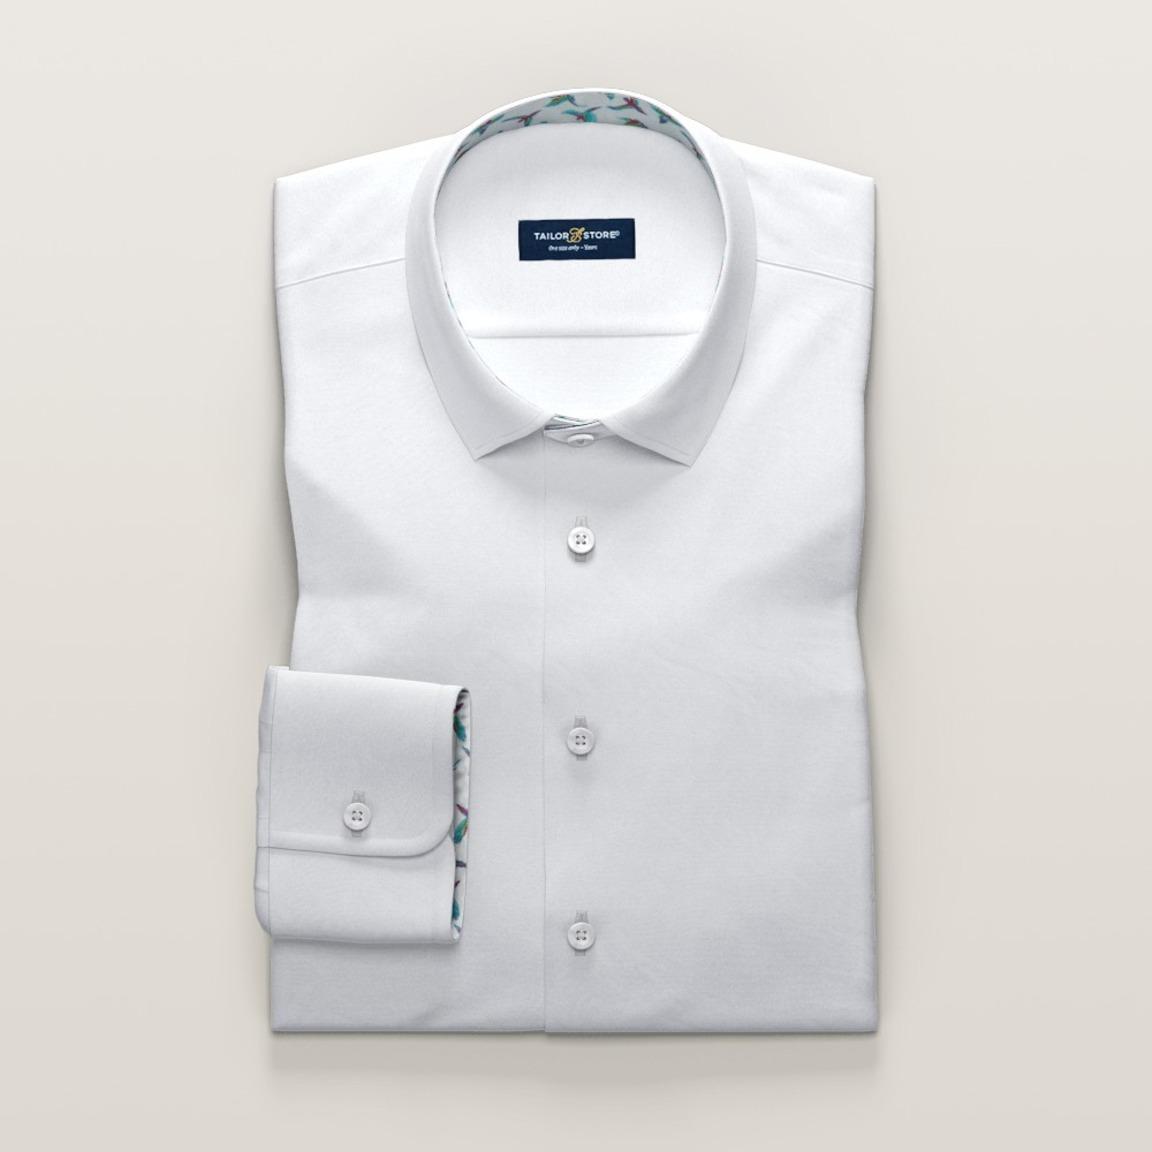 Satin dress shirt with turquoise bird print contrasts